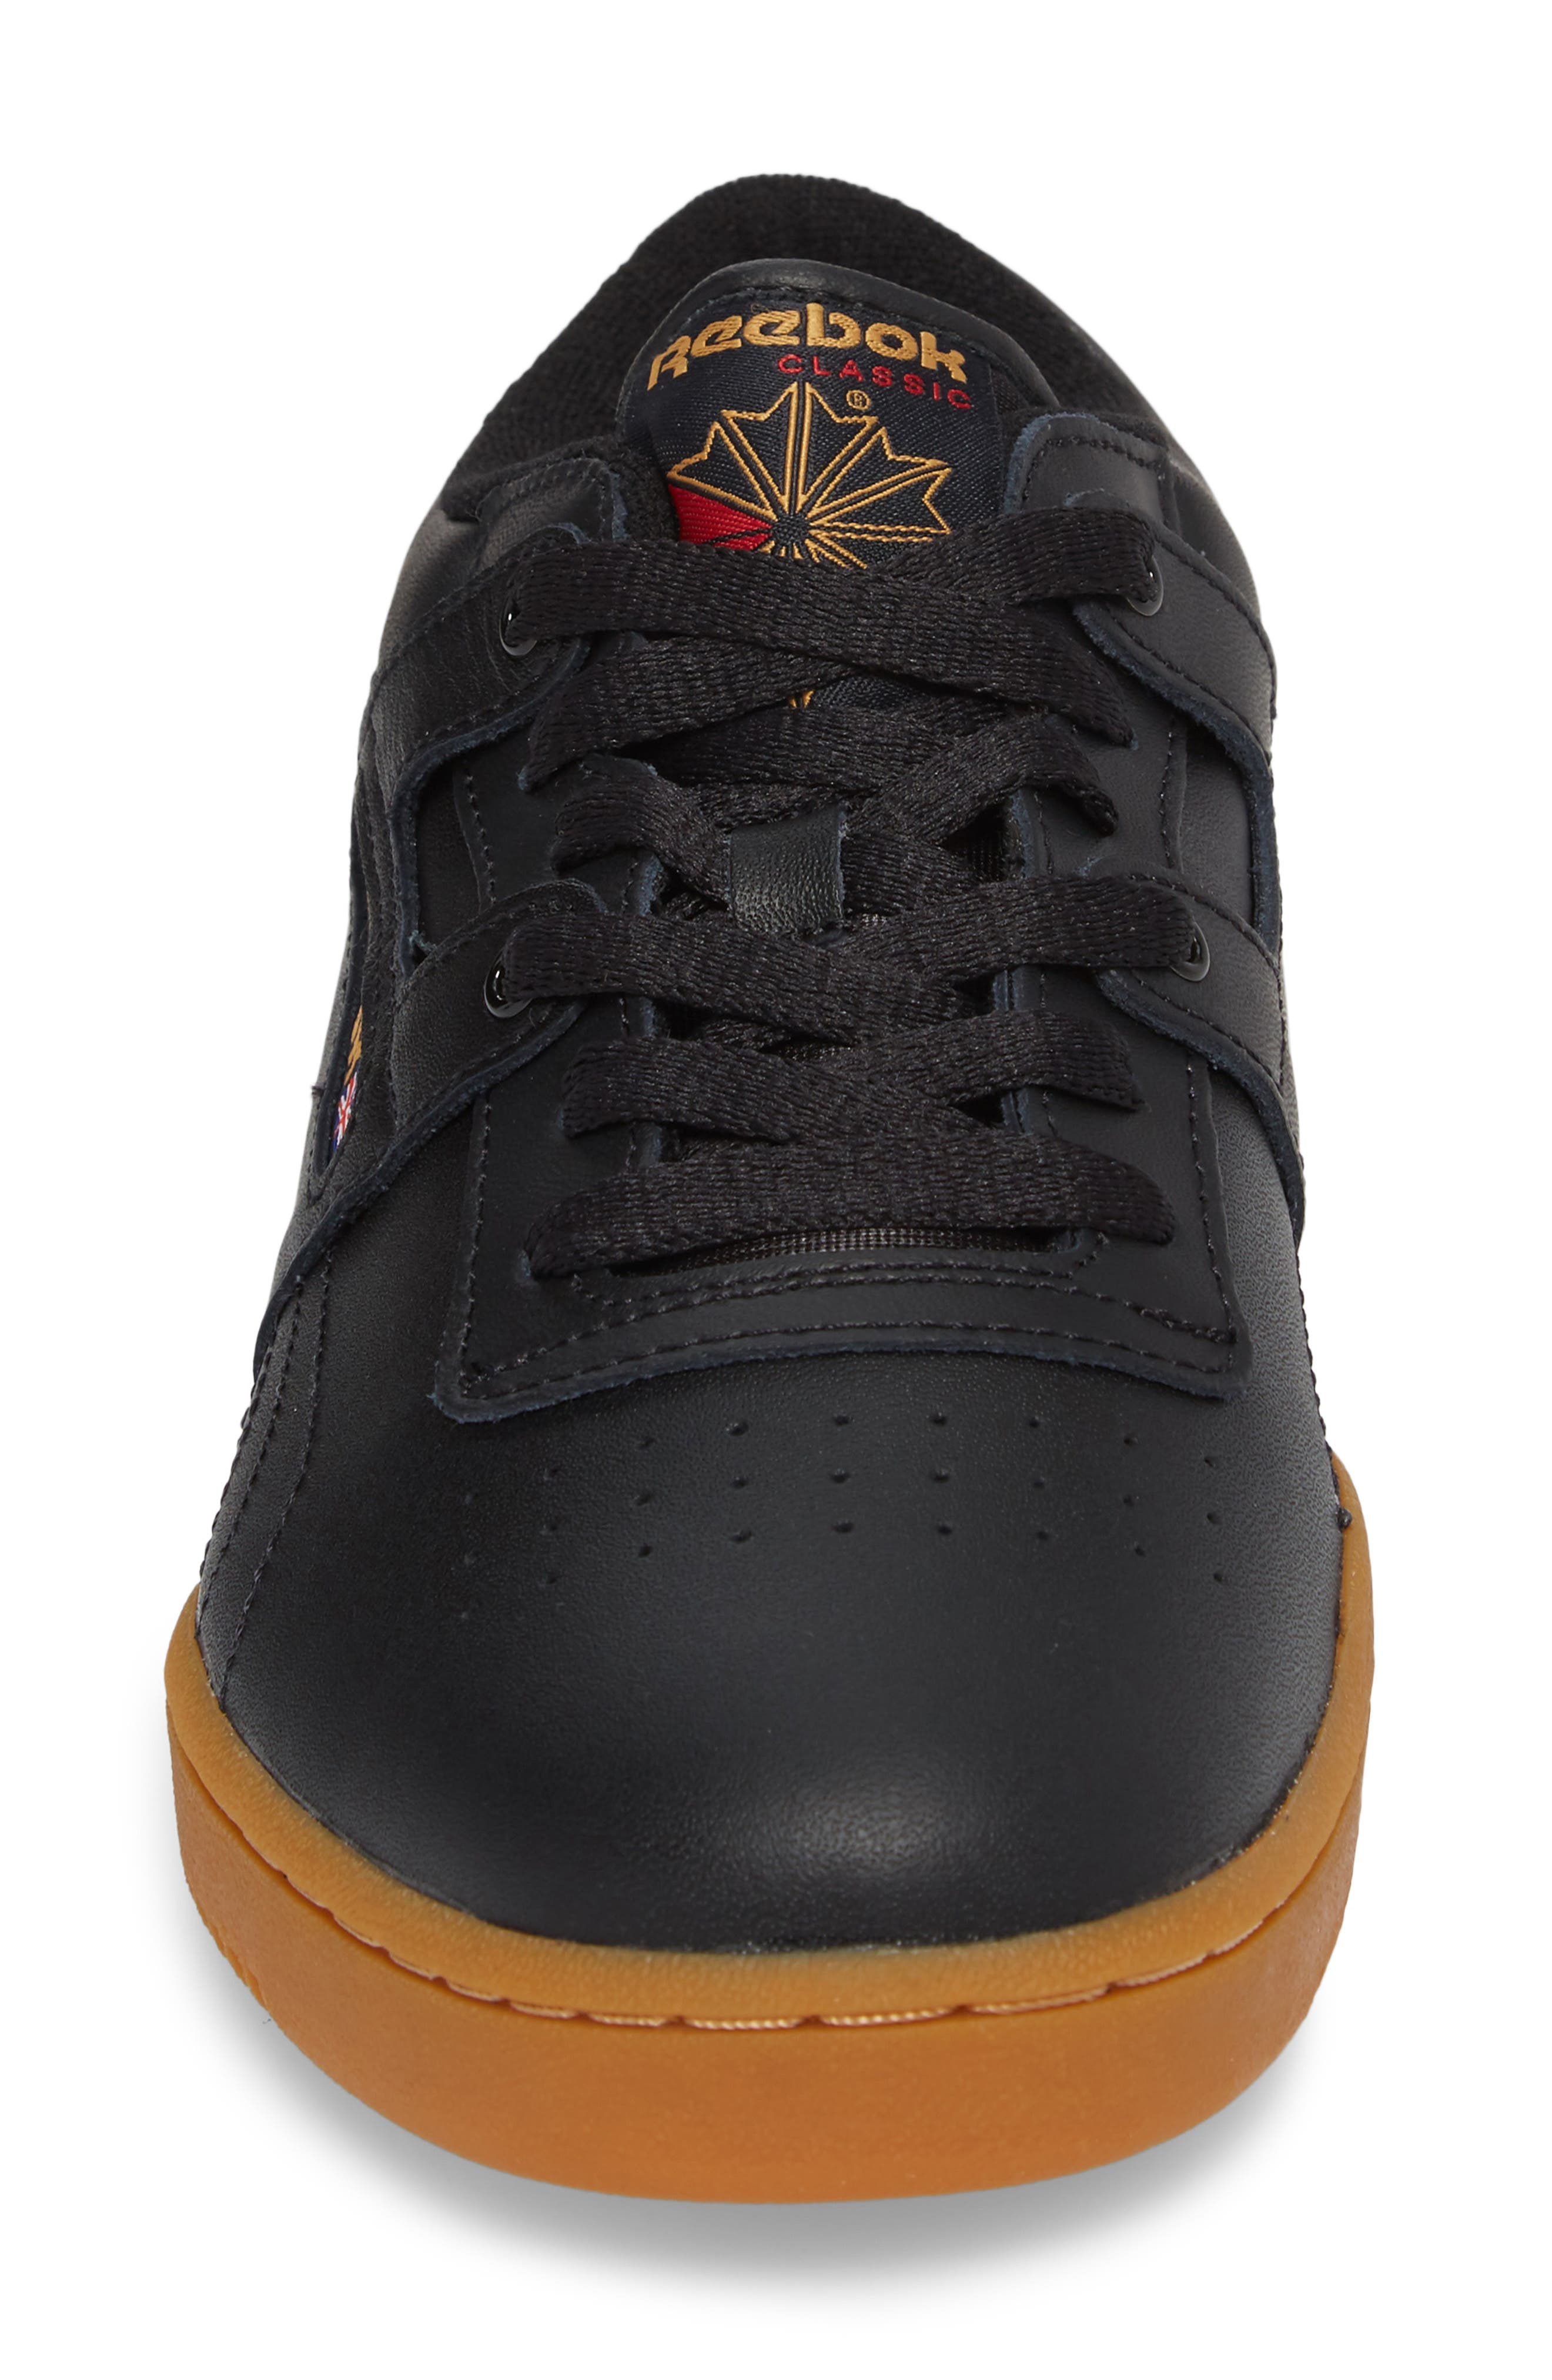 Workout Low Top Sneaker,                             Alternate thumbnail 4, color,                             Black